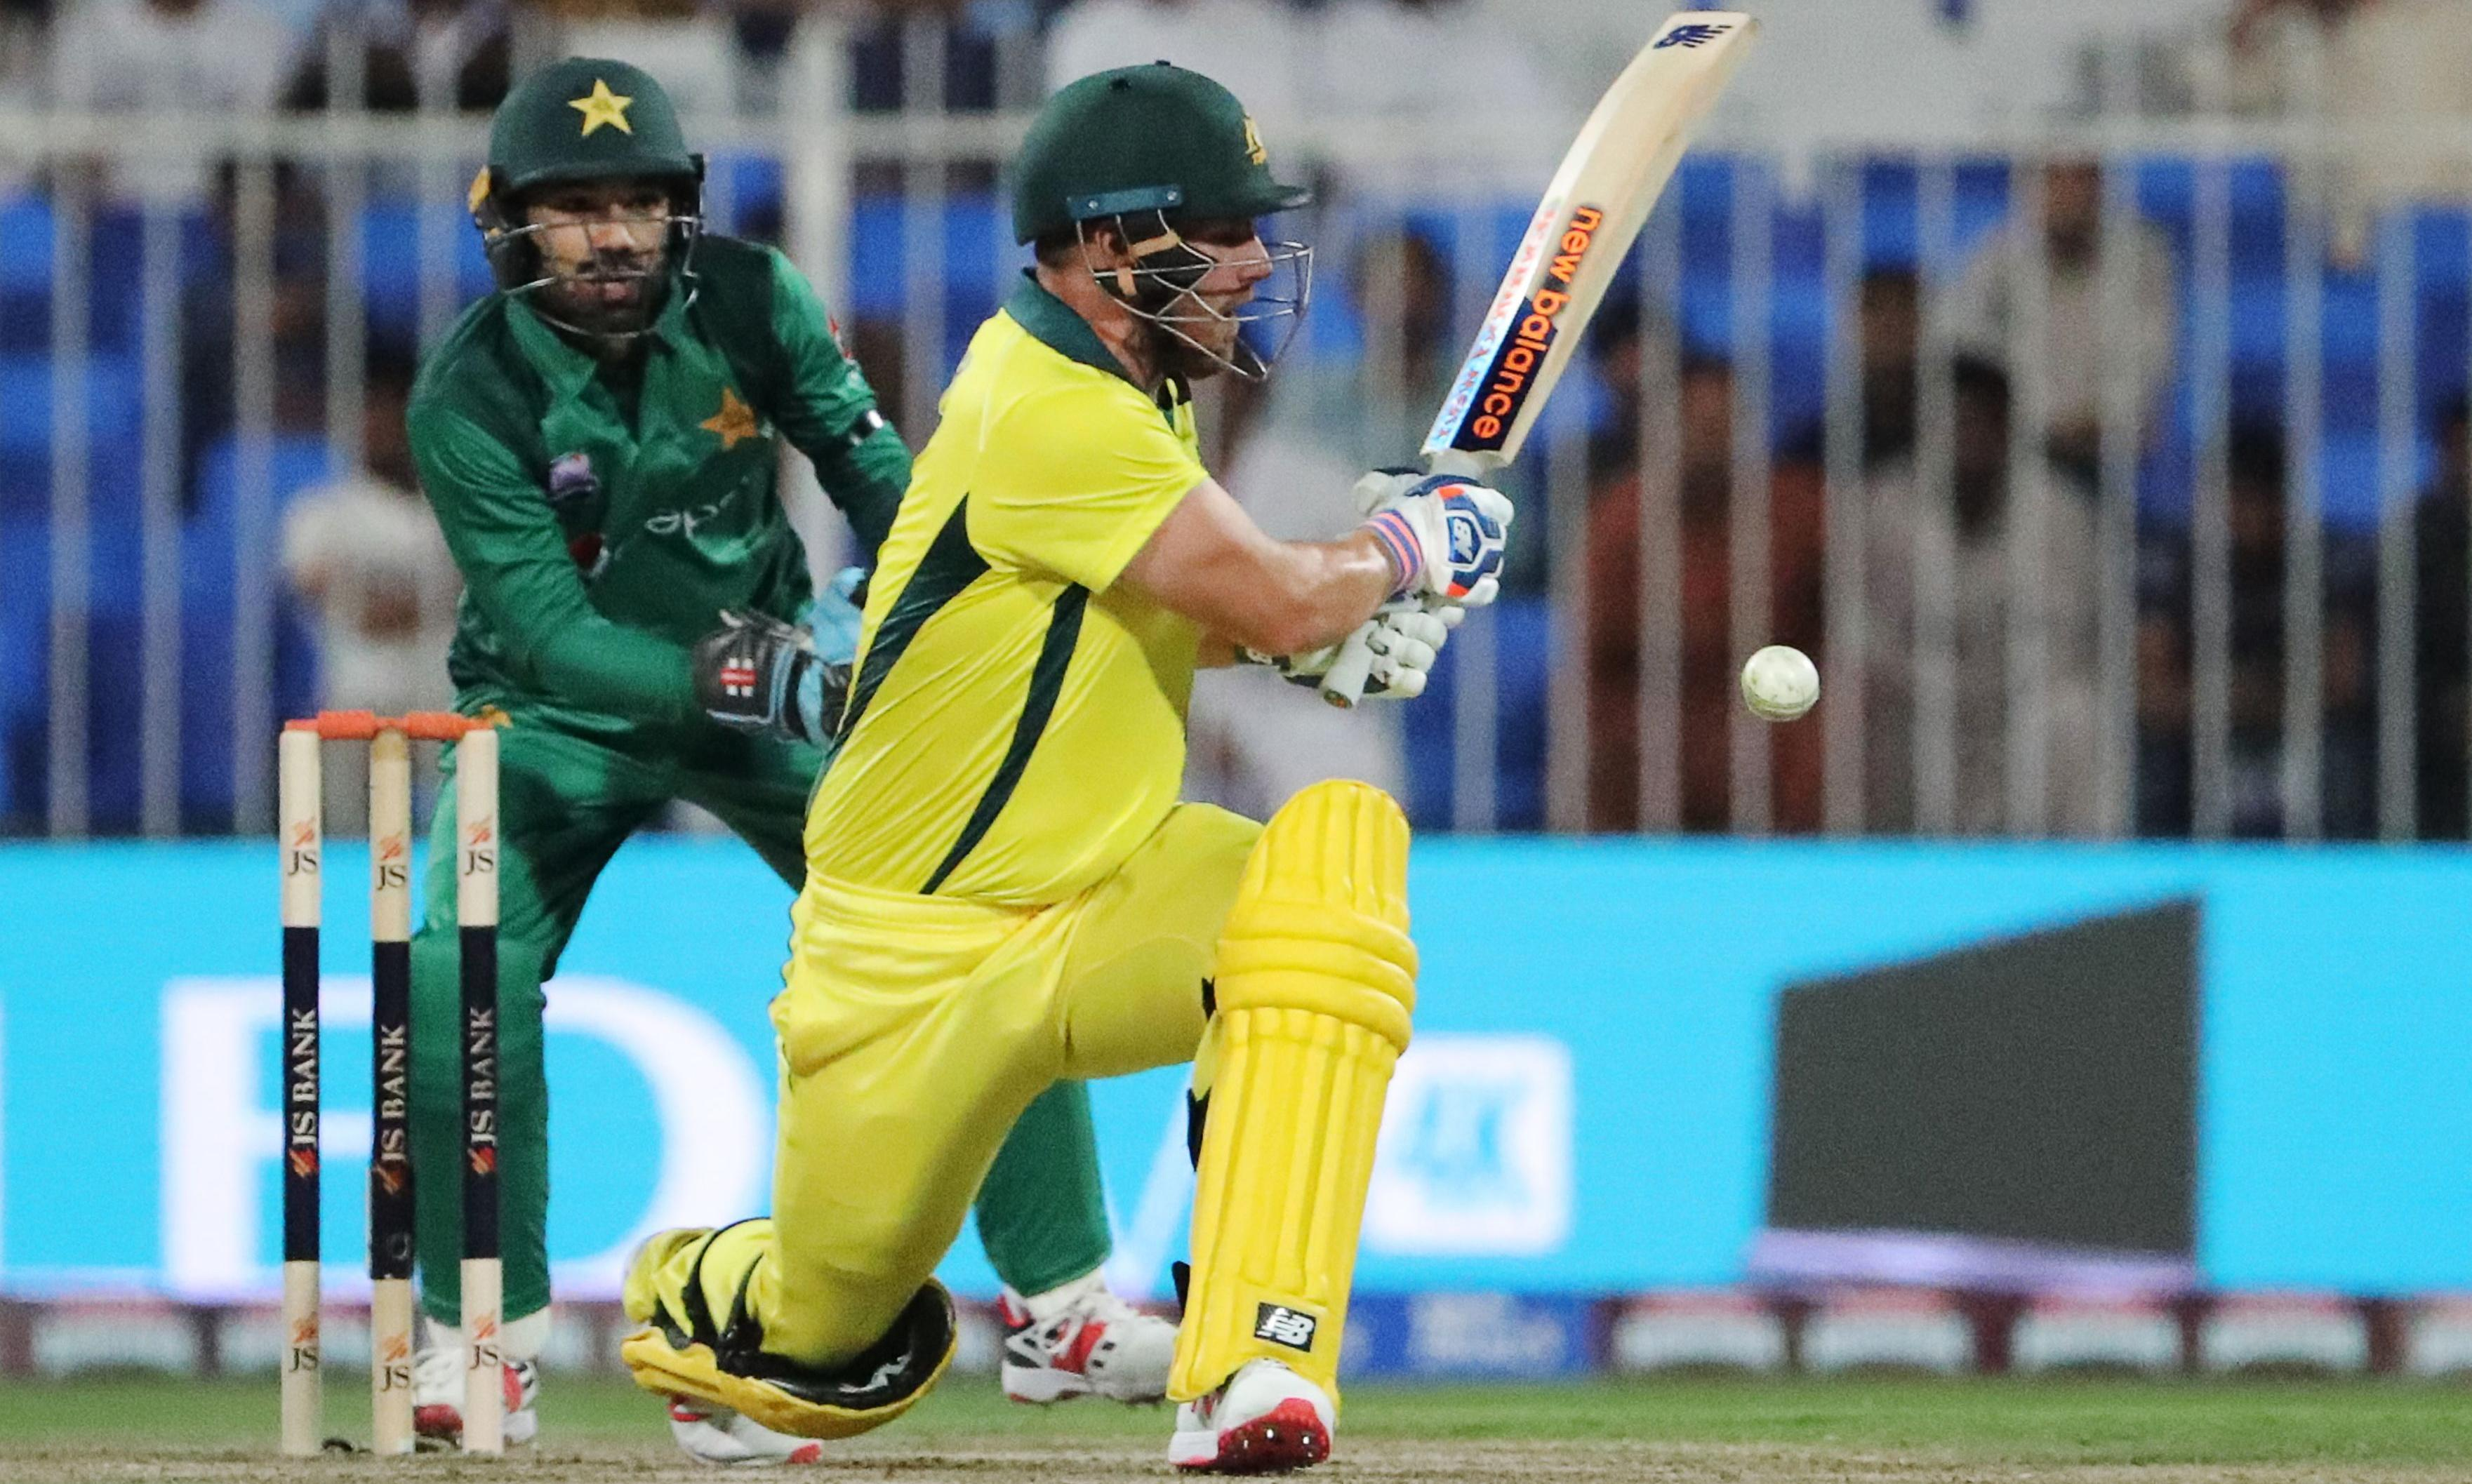 Aaron Finch hits match-winning century as Australia down Pakistan